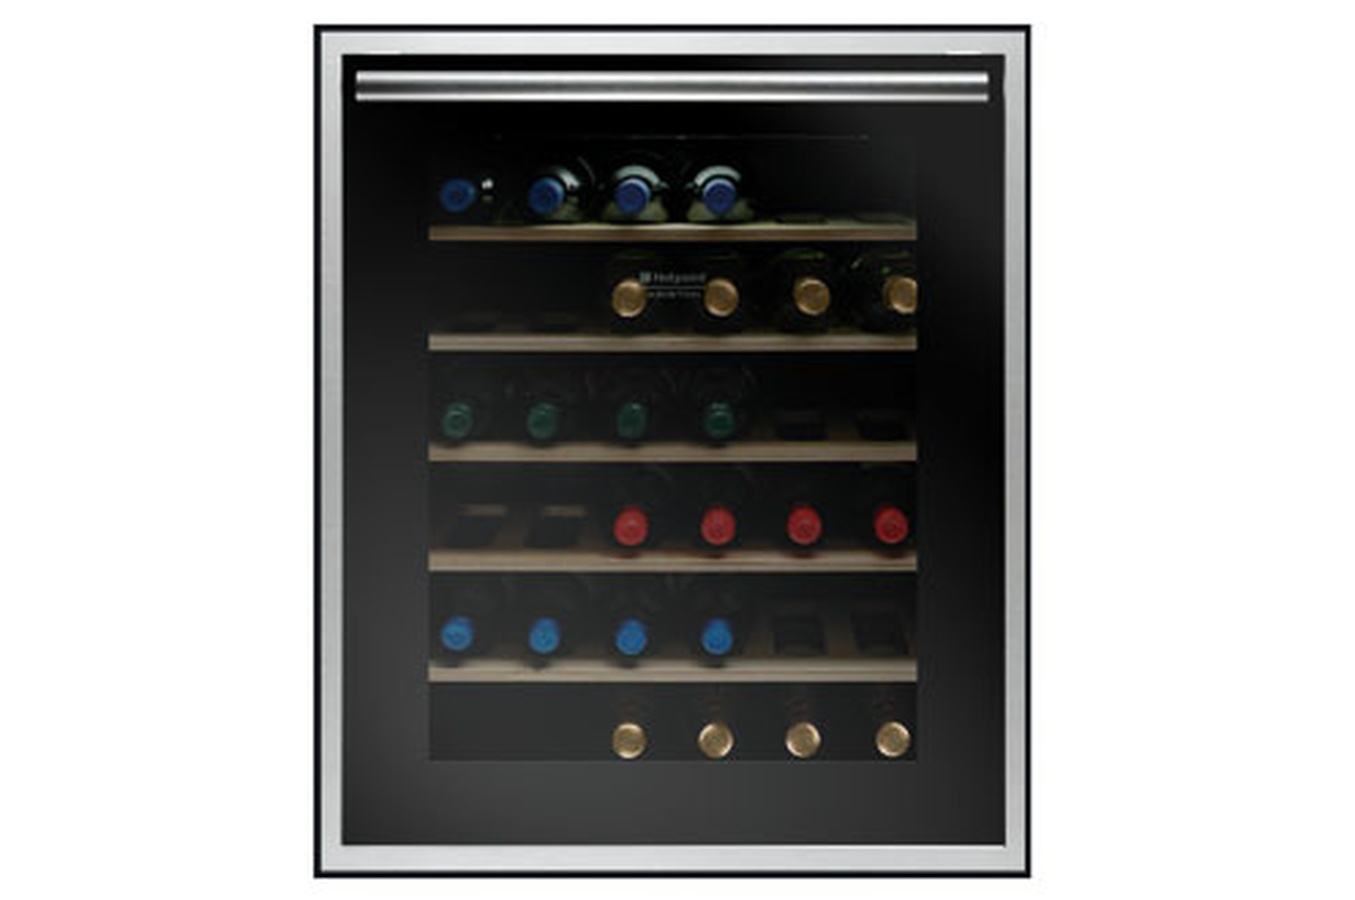 cave a vin que choisir europen amenagement cave a vin bois cave a vin choisir inspiration pour. Black Bedroom Furniture Sets. Home Design Ideas